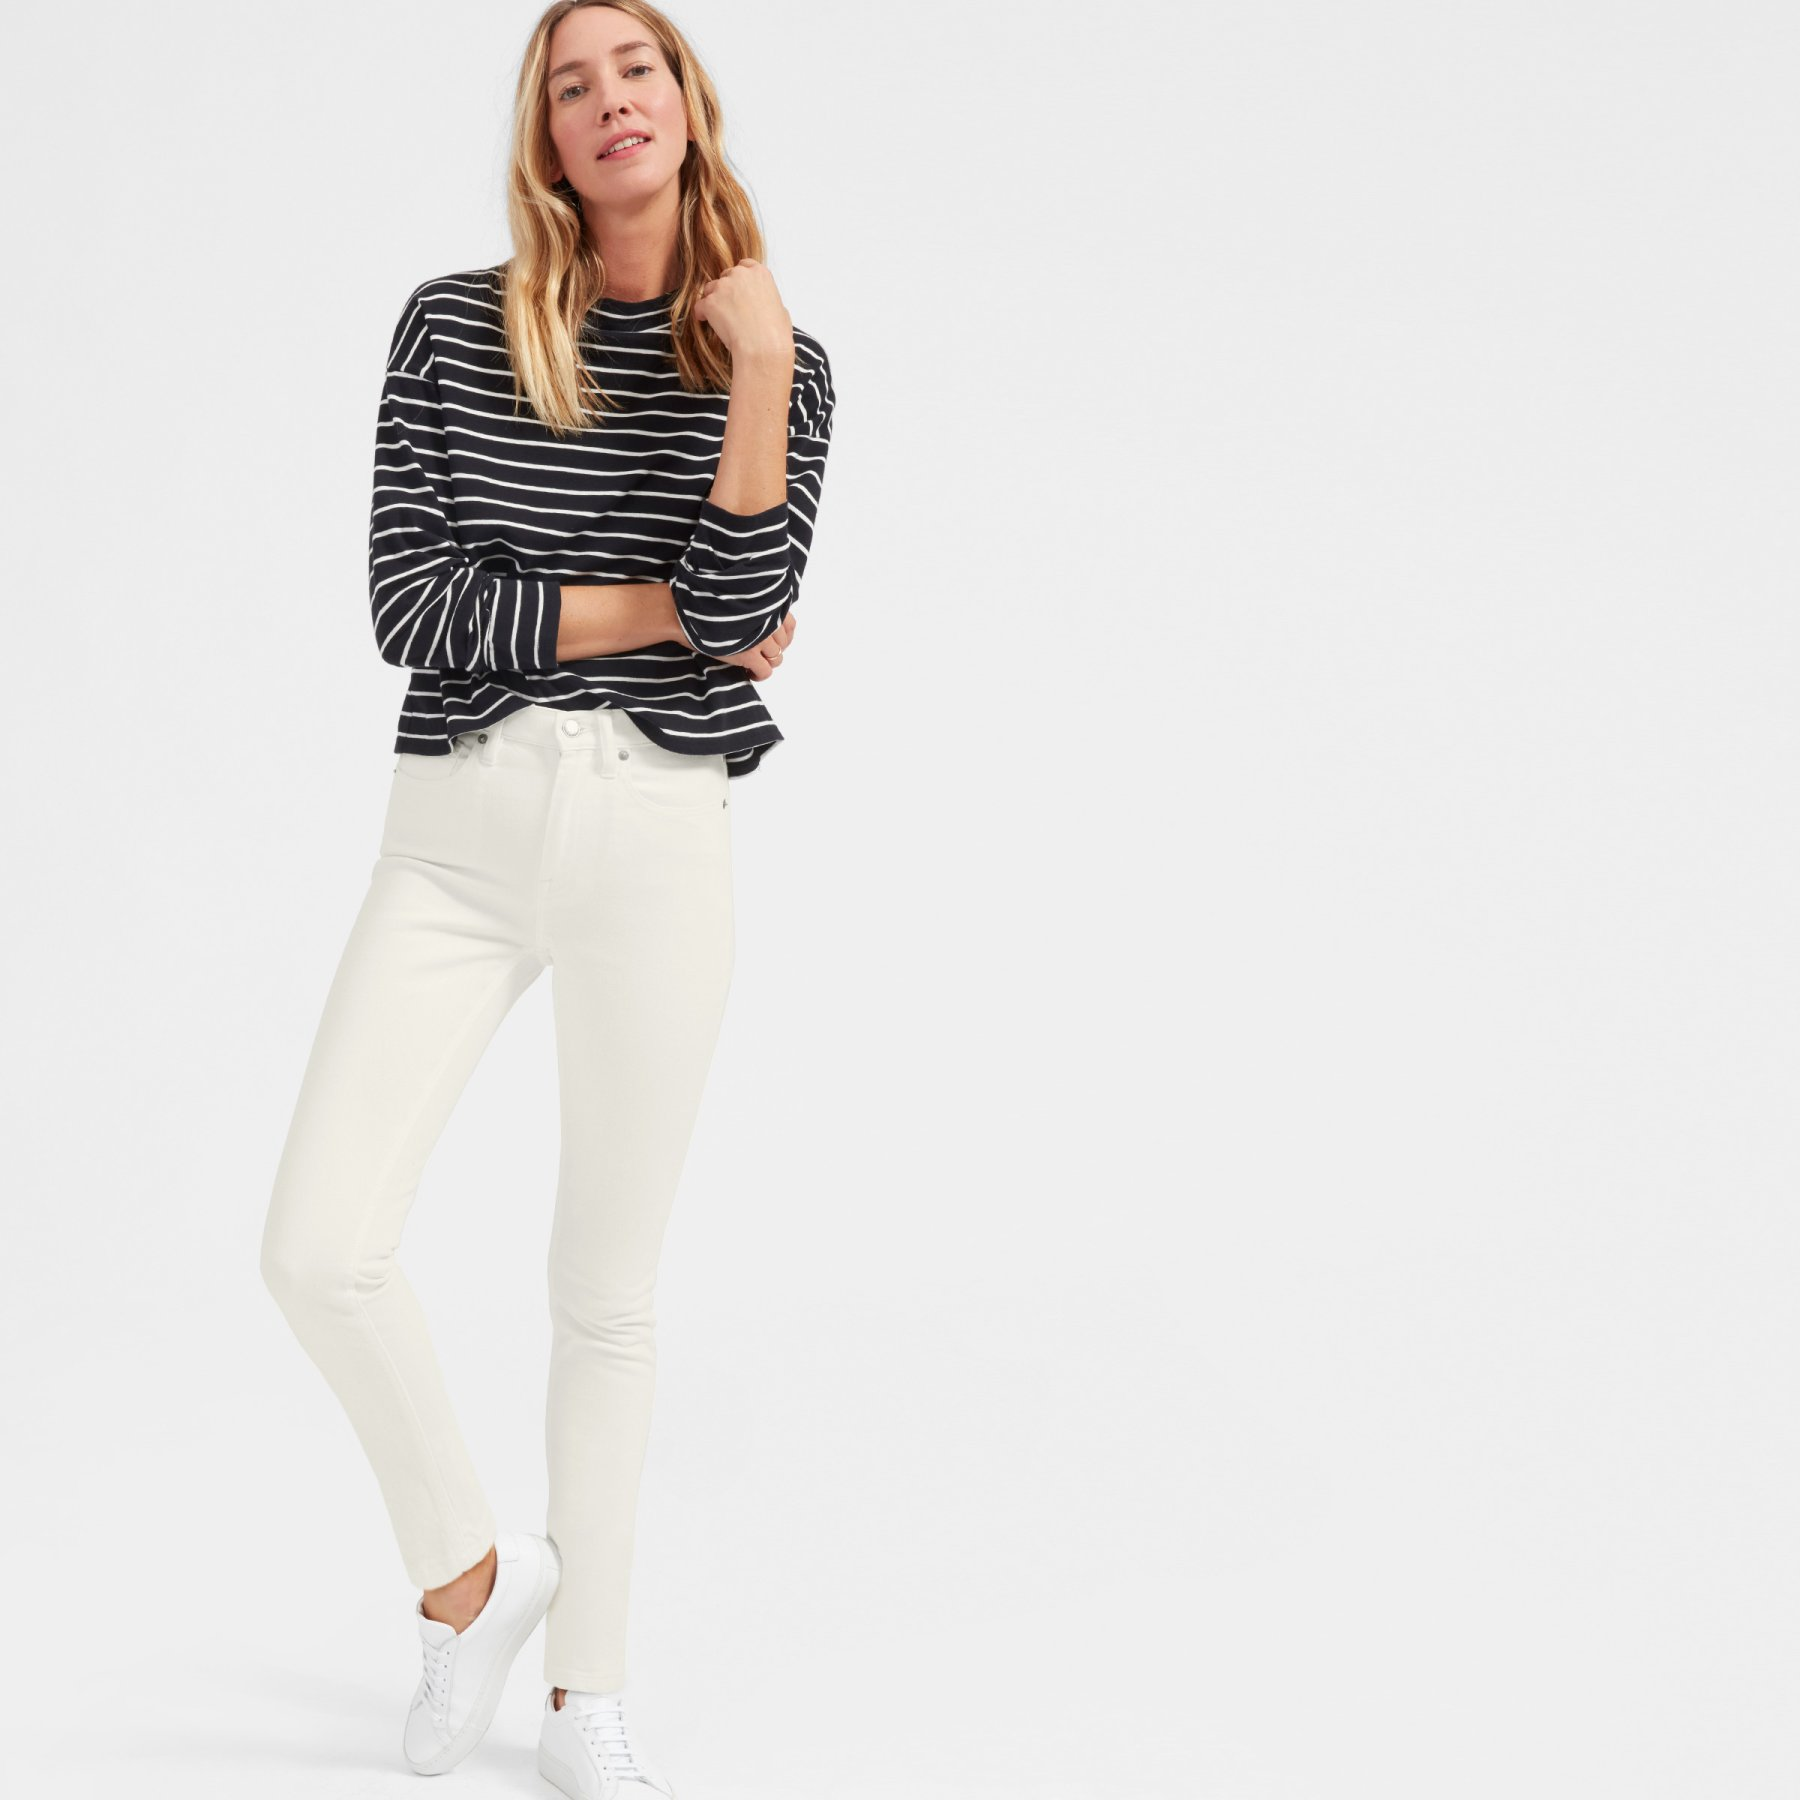 everlane-high-waist-white-denim-caitlin-elizabeth-james-blog.jpg